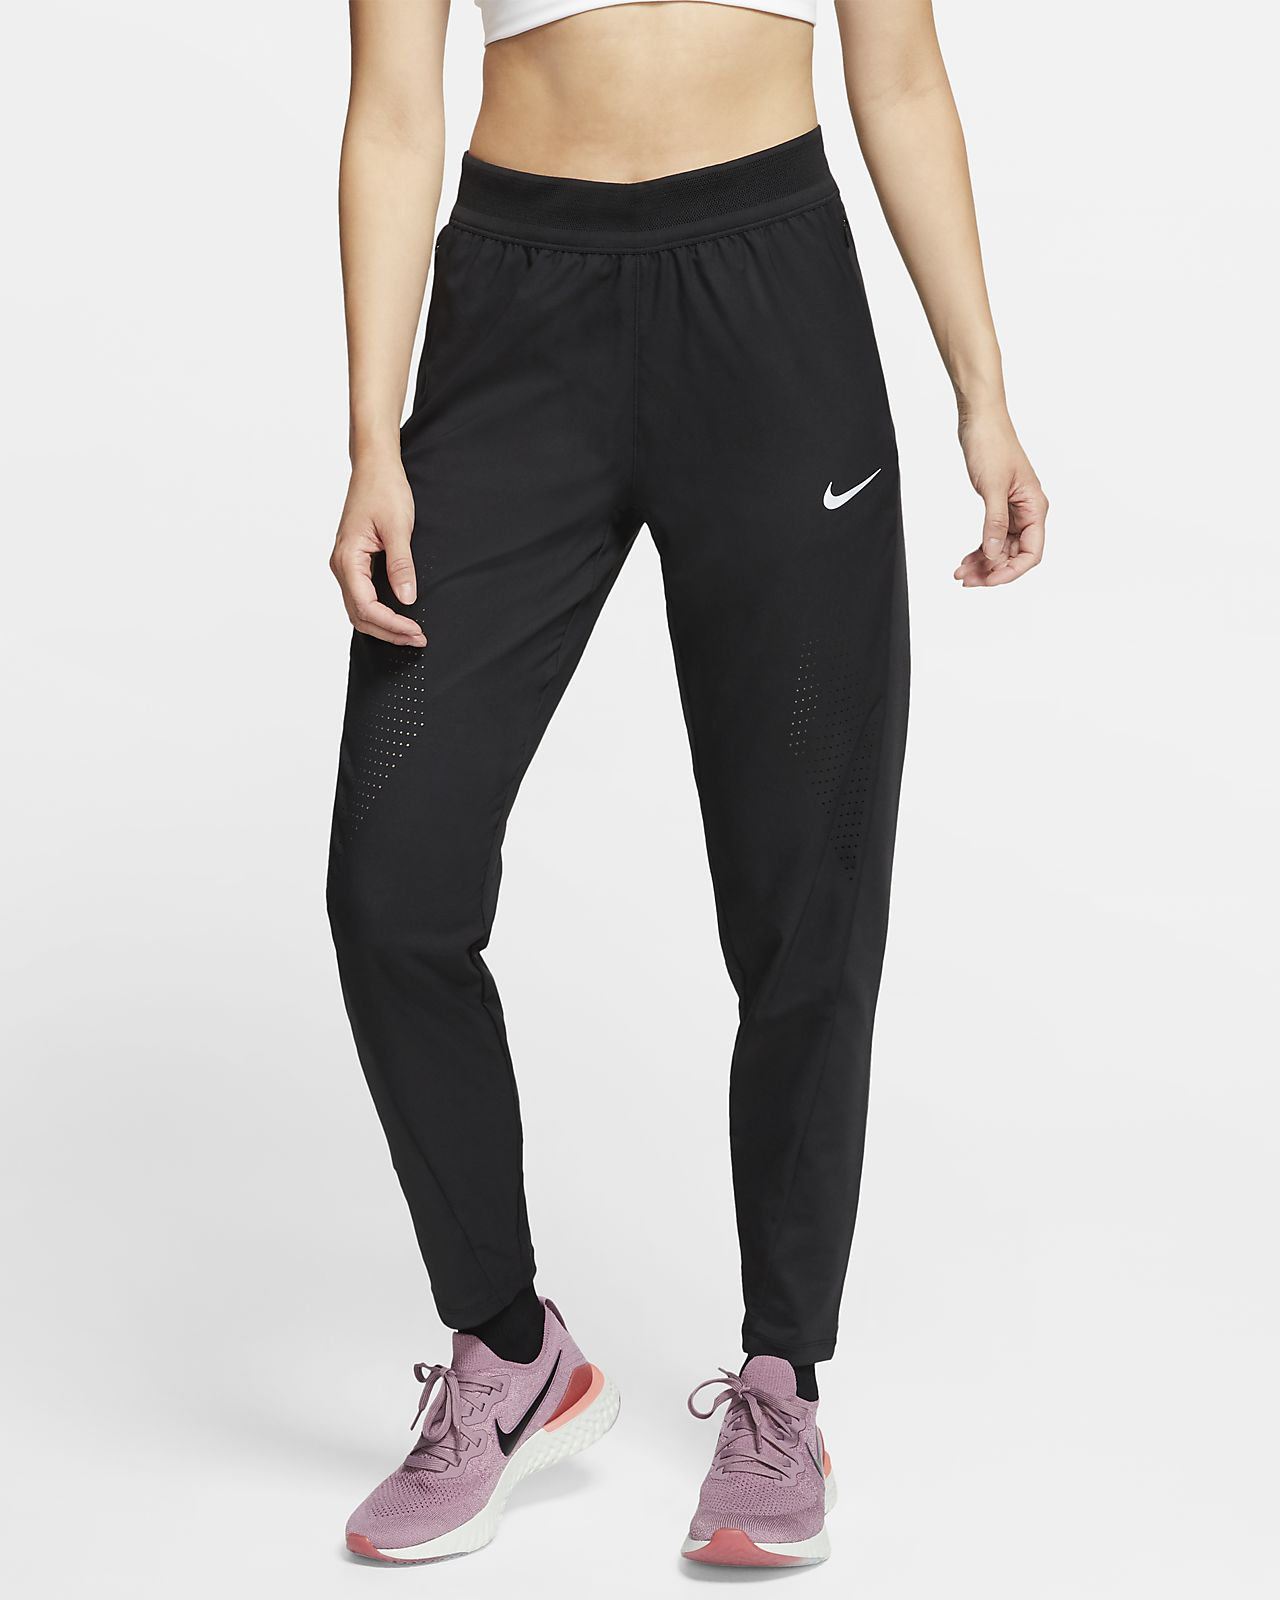 Nike Swift Women's Running Trousers